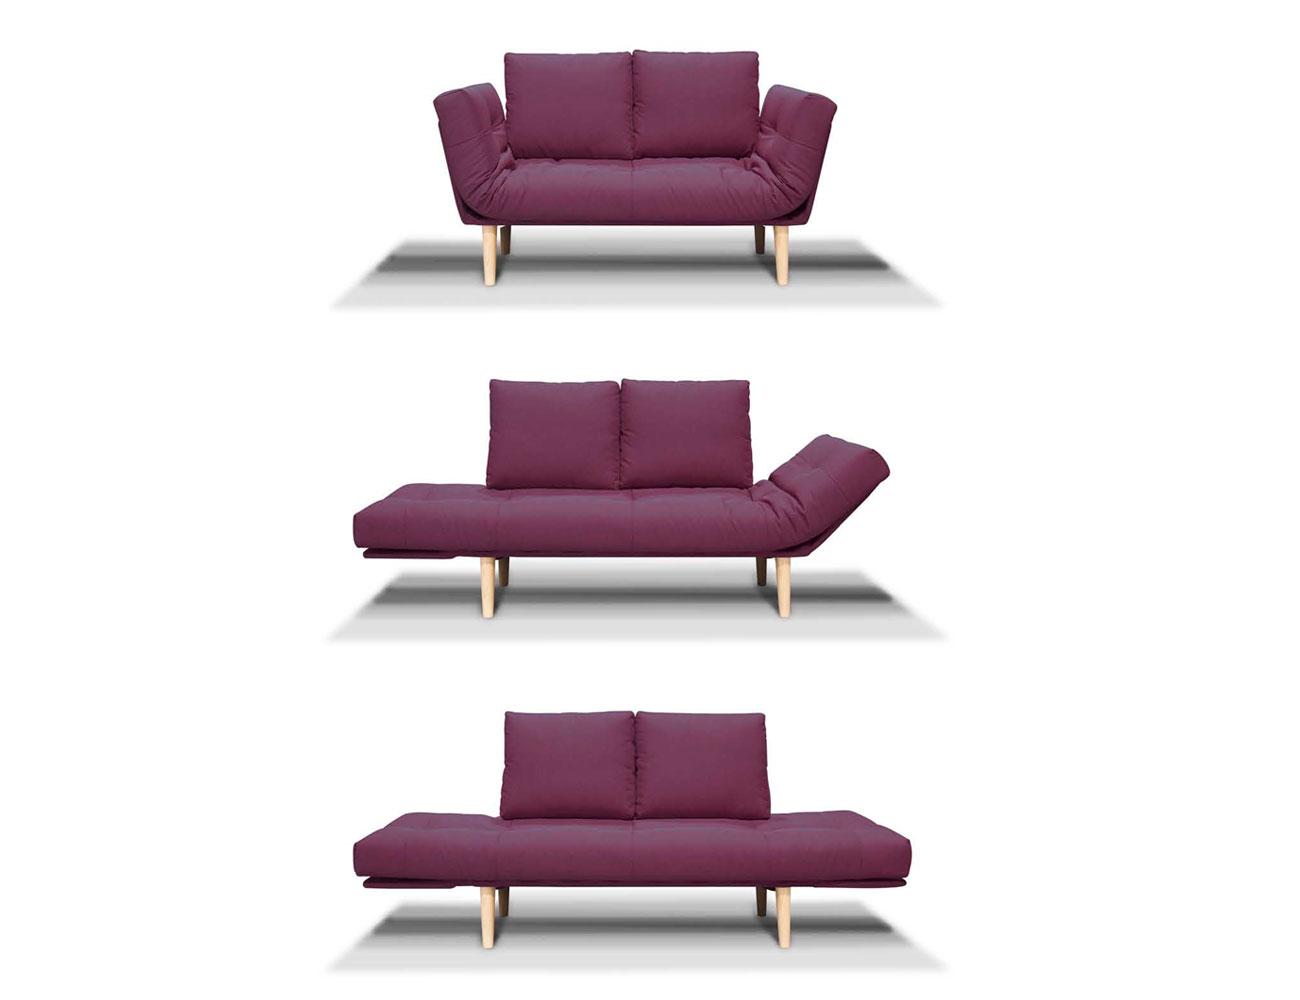 Sof cama convertible 18068 factory del mueble utrera - Mueble sofa cama ...